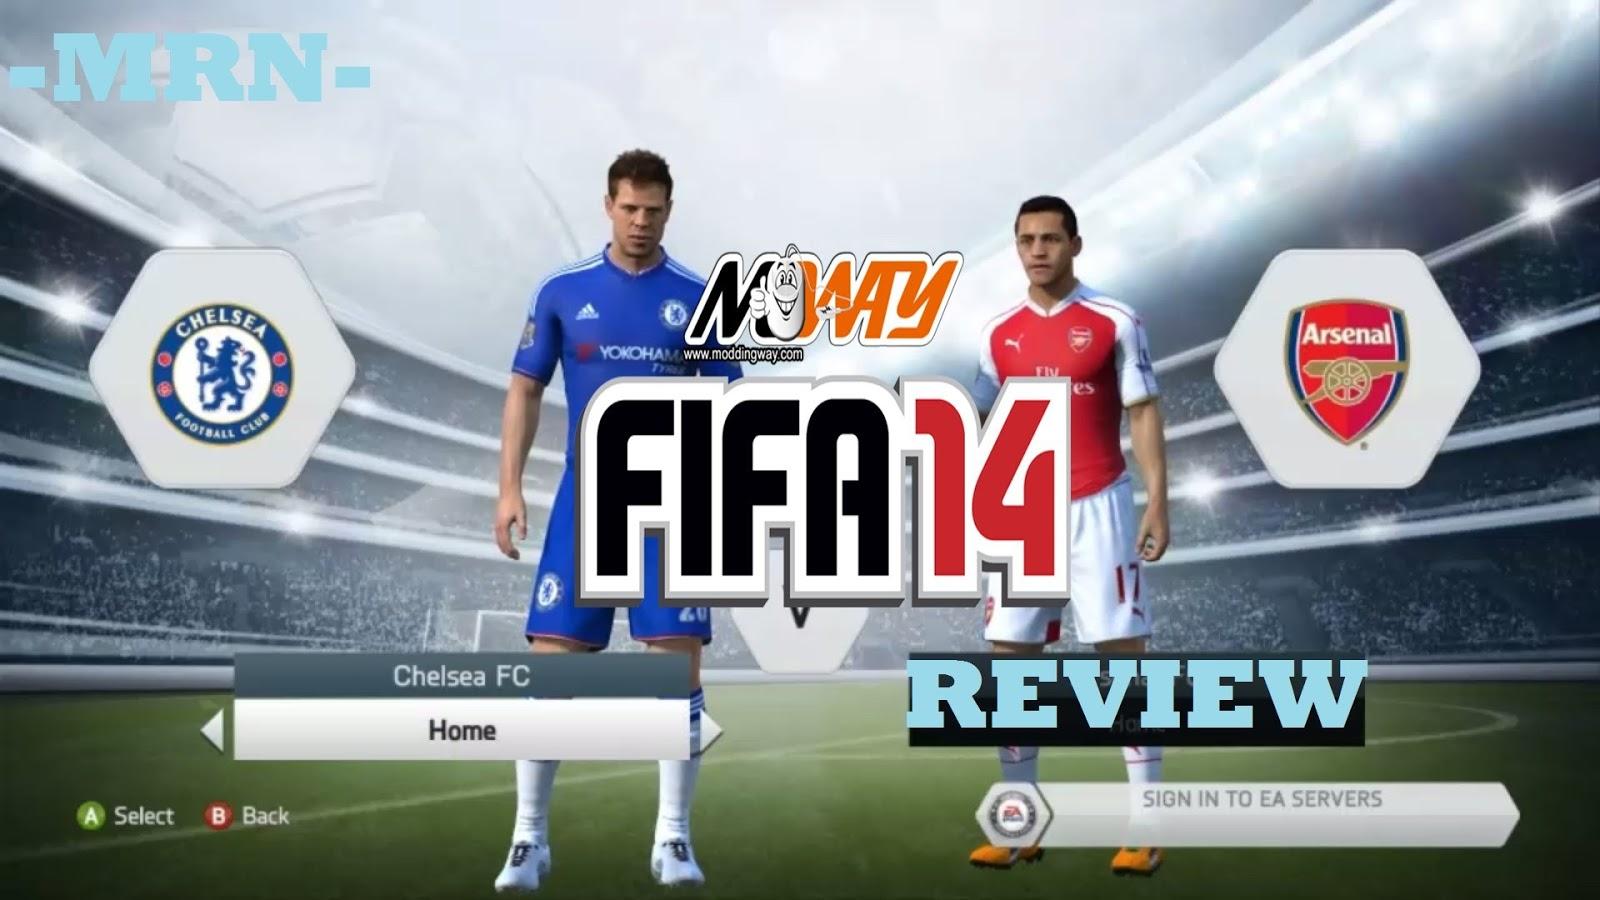 FIFA 14 Full Update Season 15/16 Latest is Here